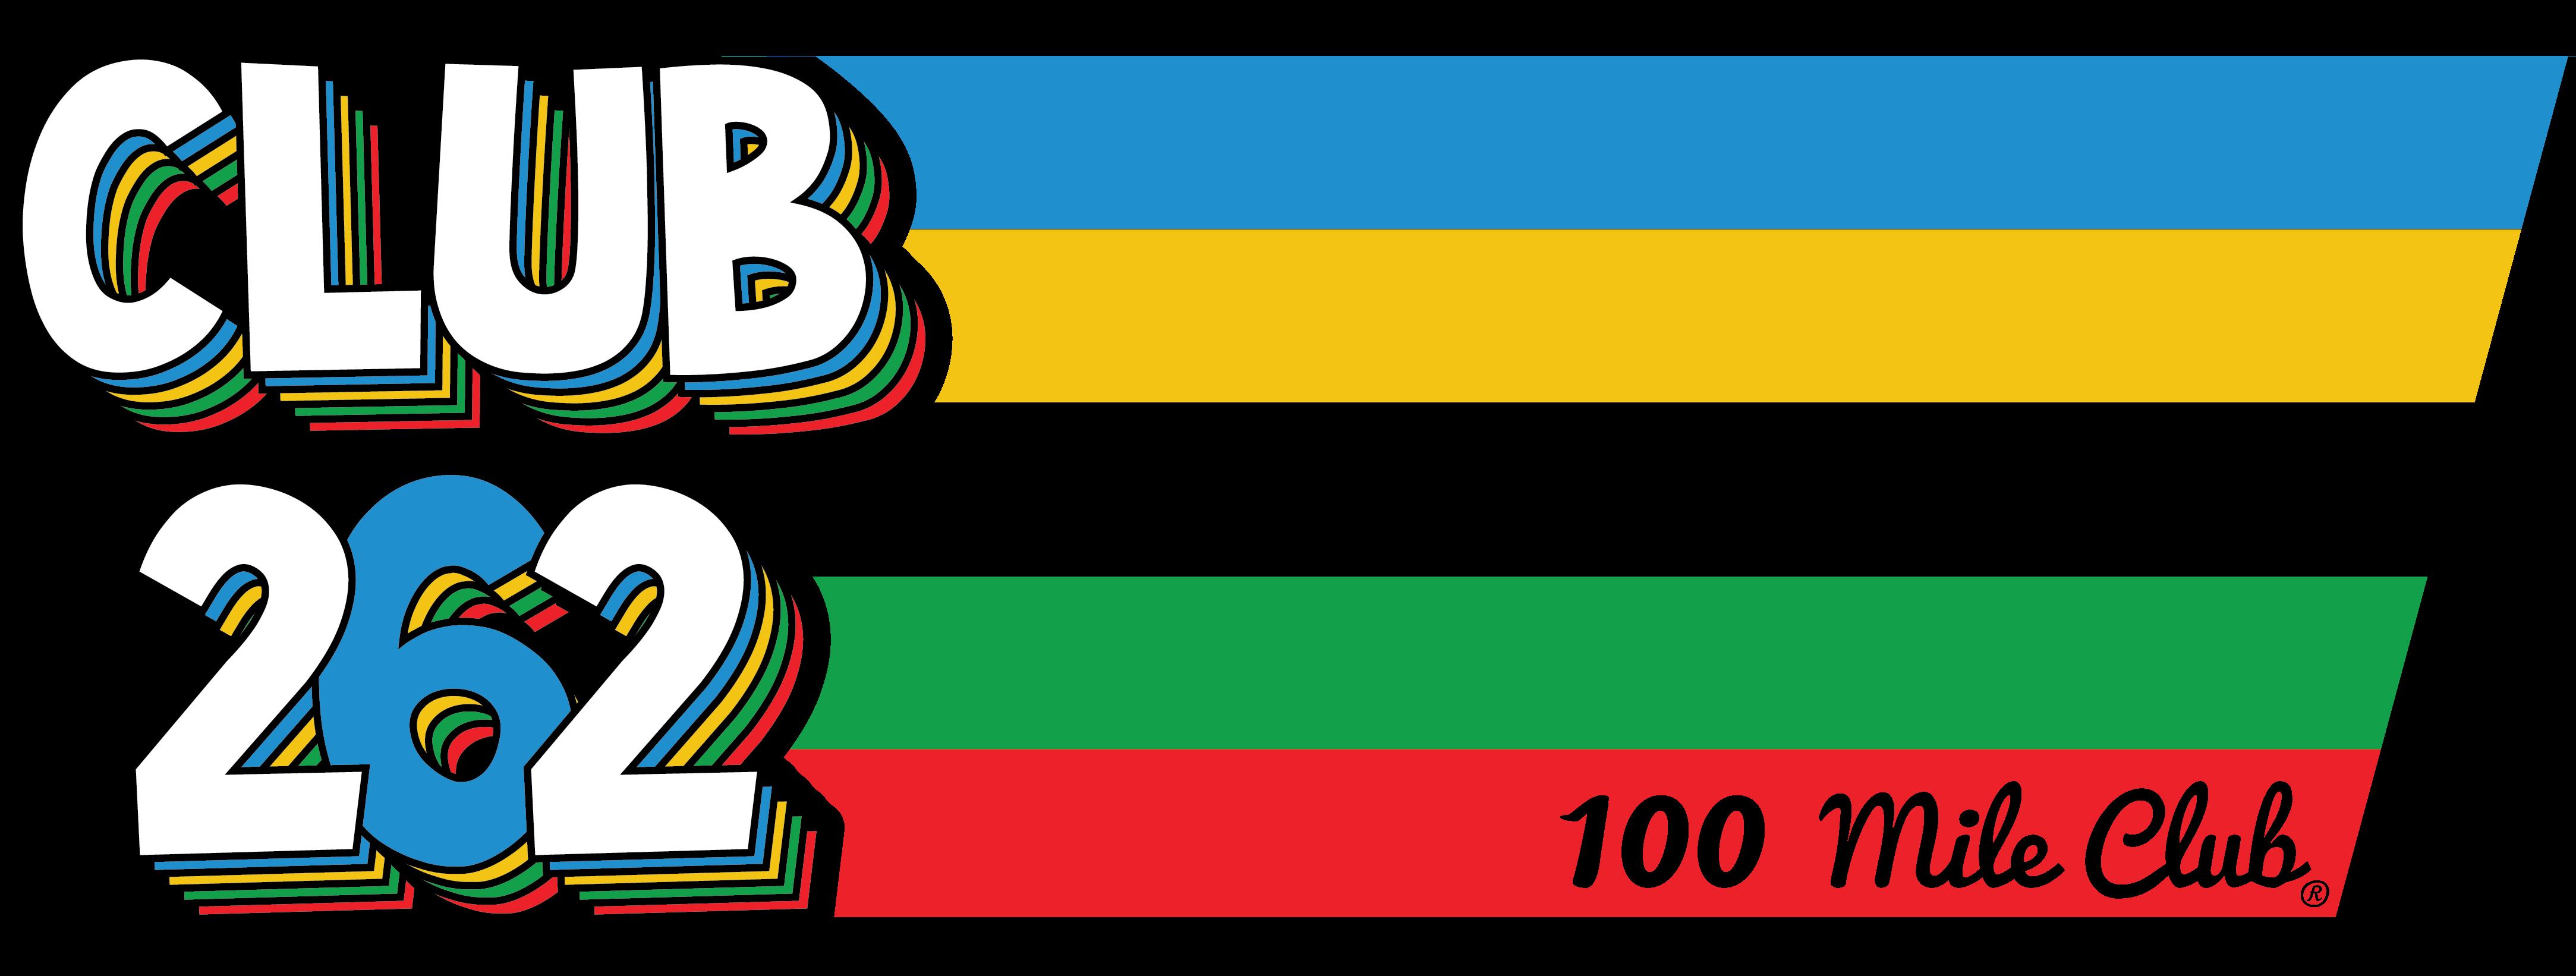 262-21-logo-w-lines-crop